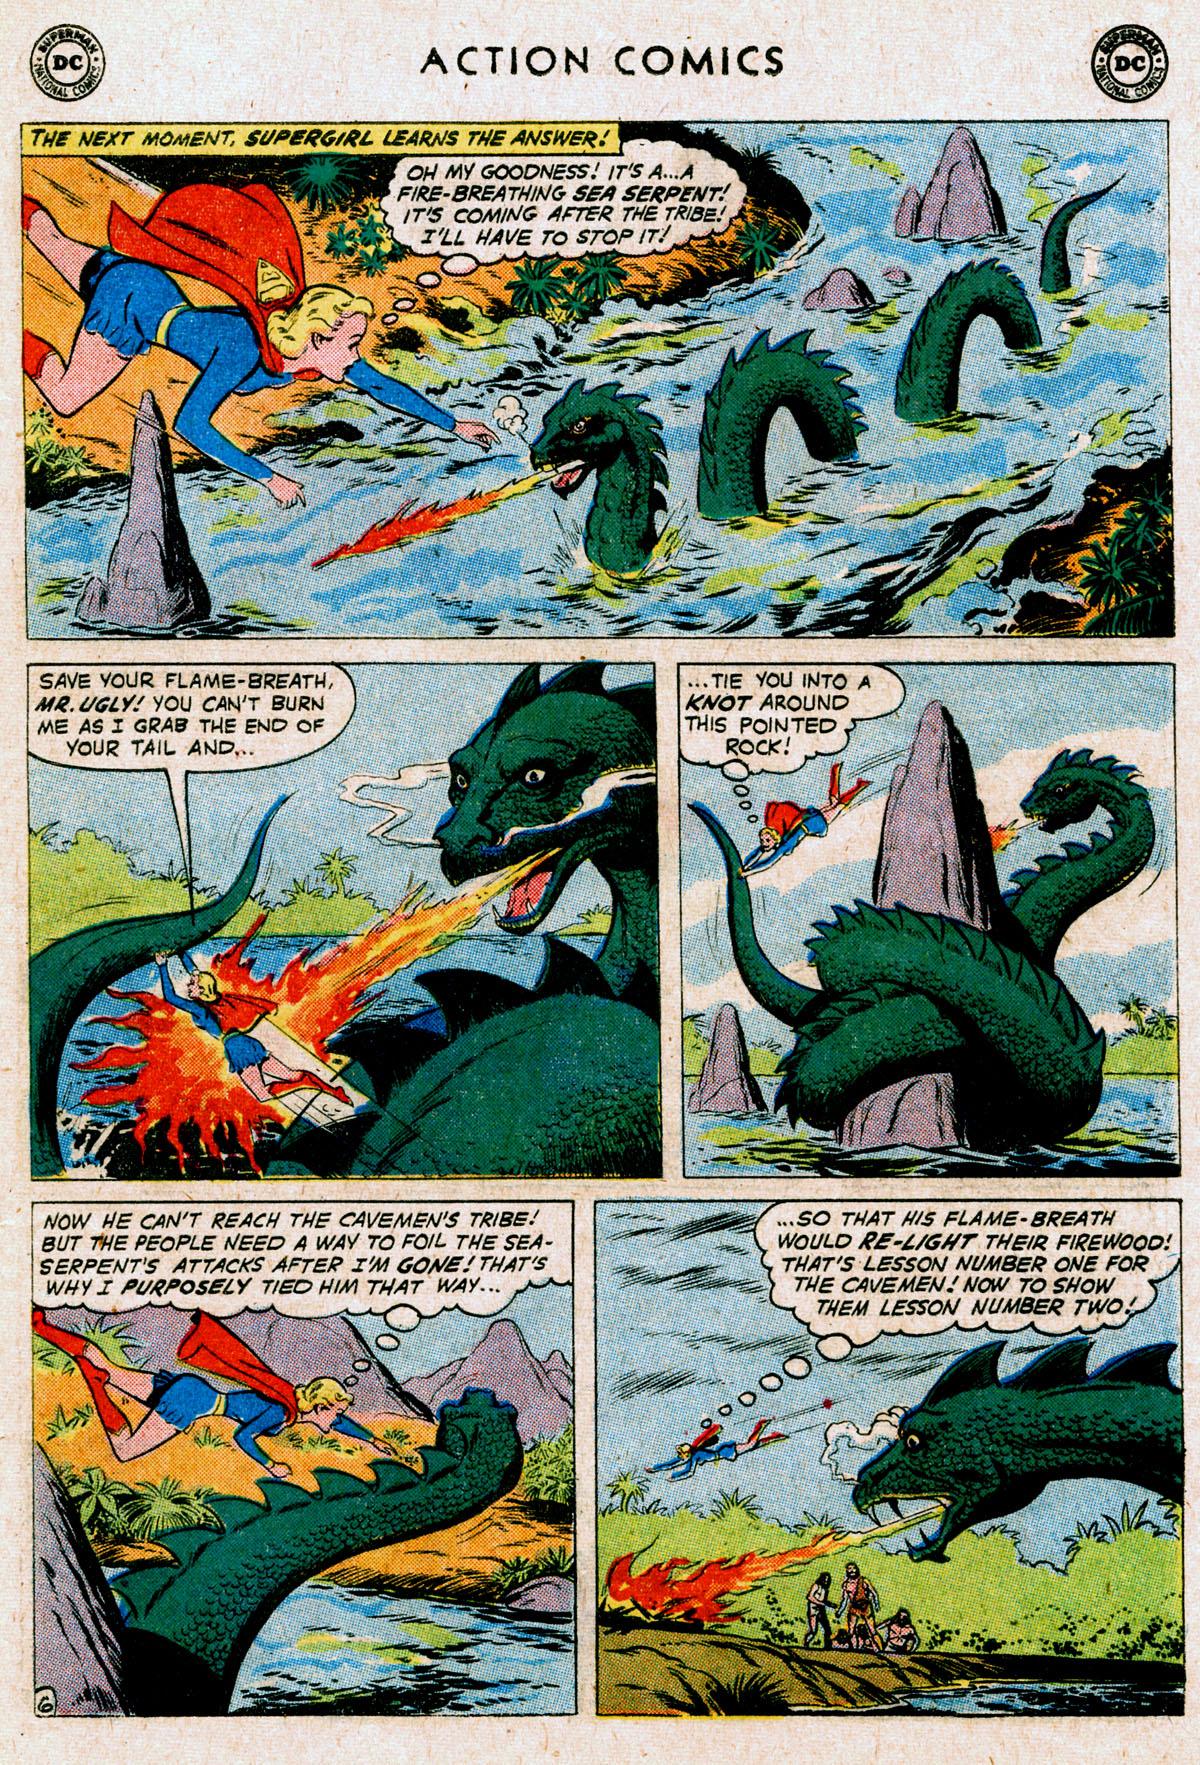 Action Comics (1938) 259 Page 30